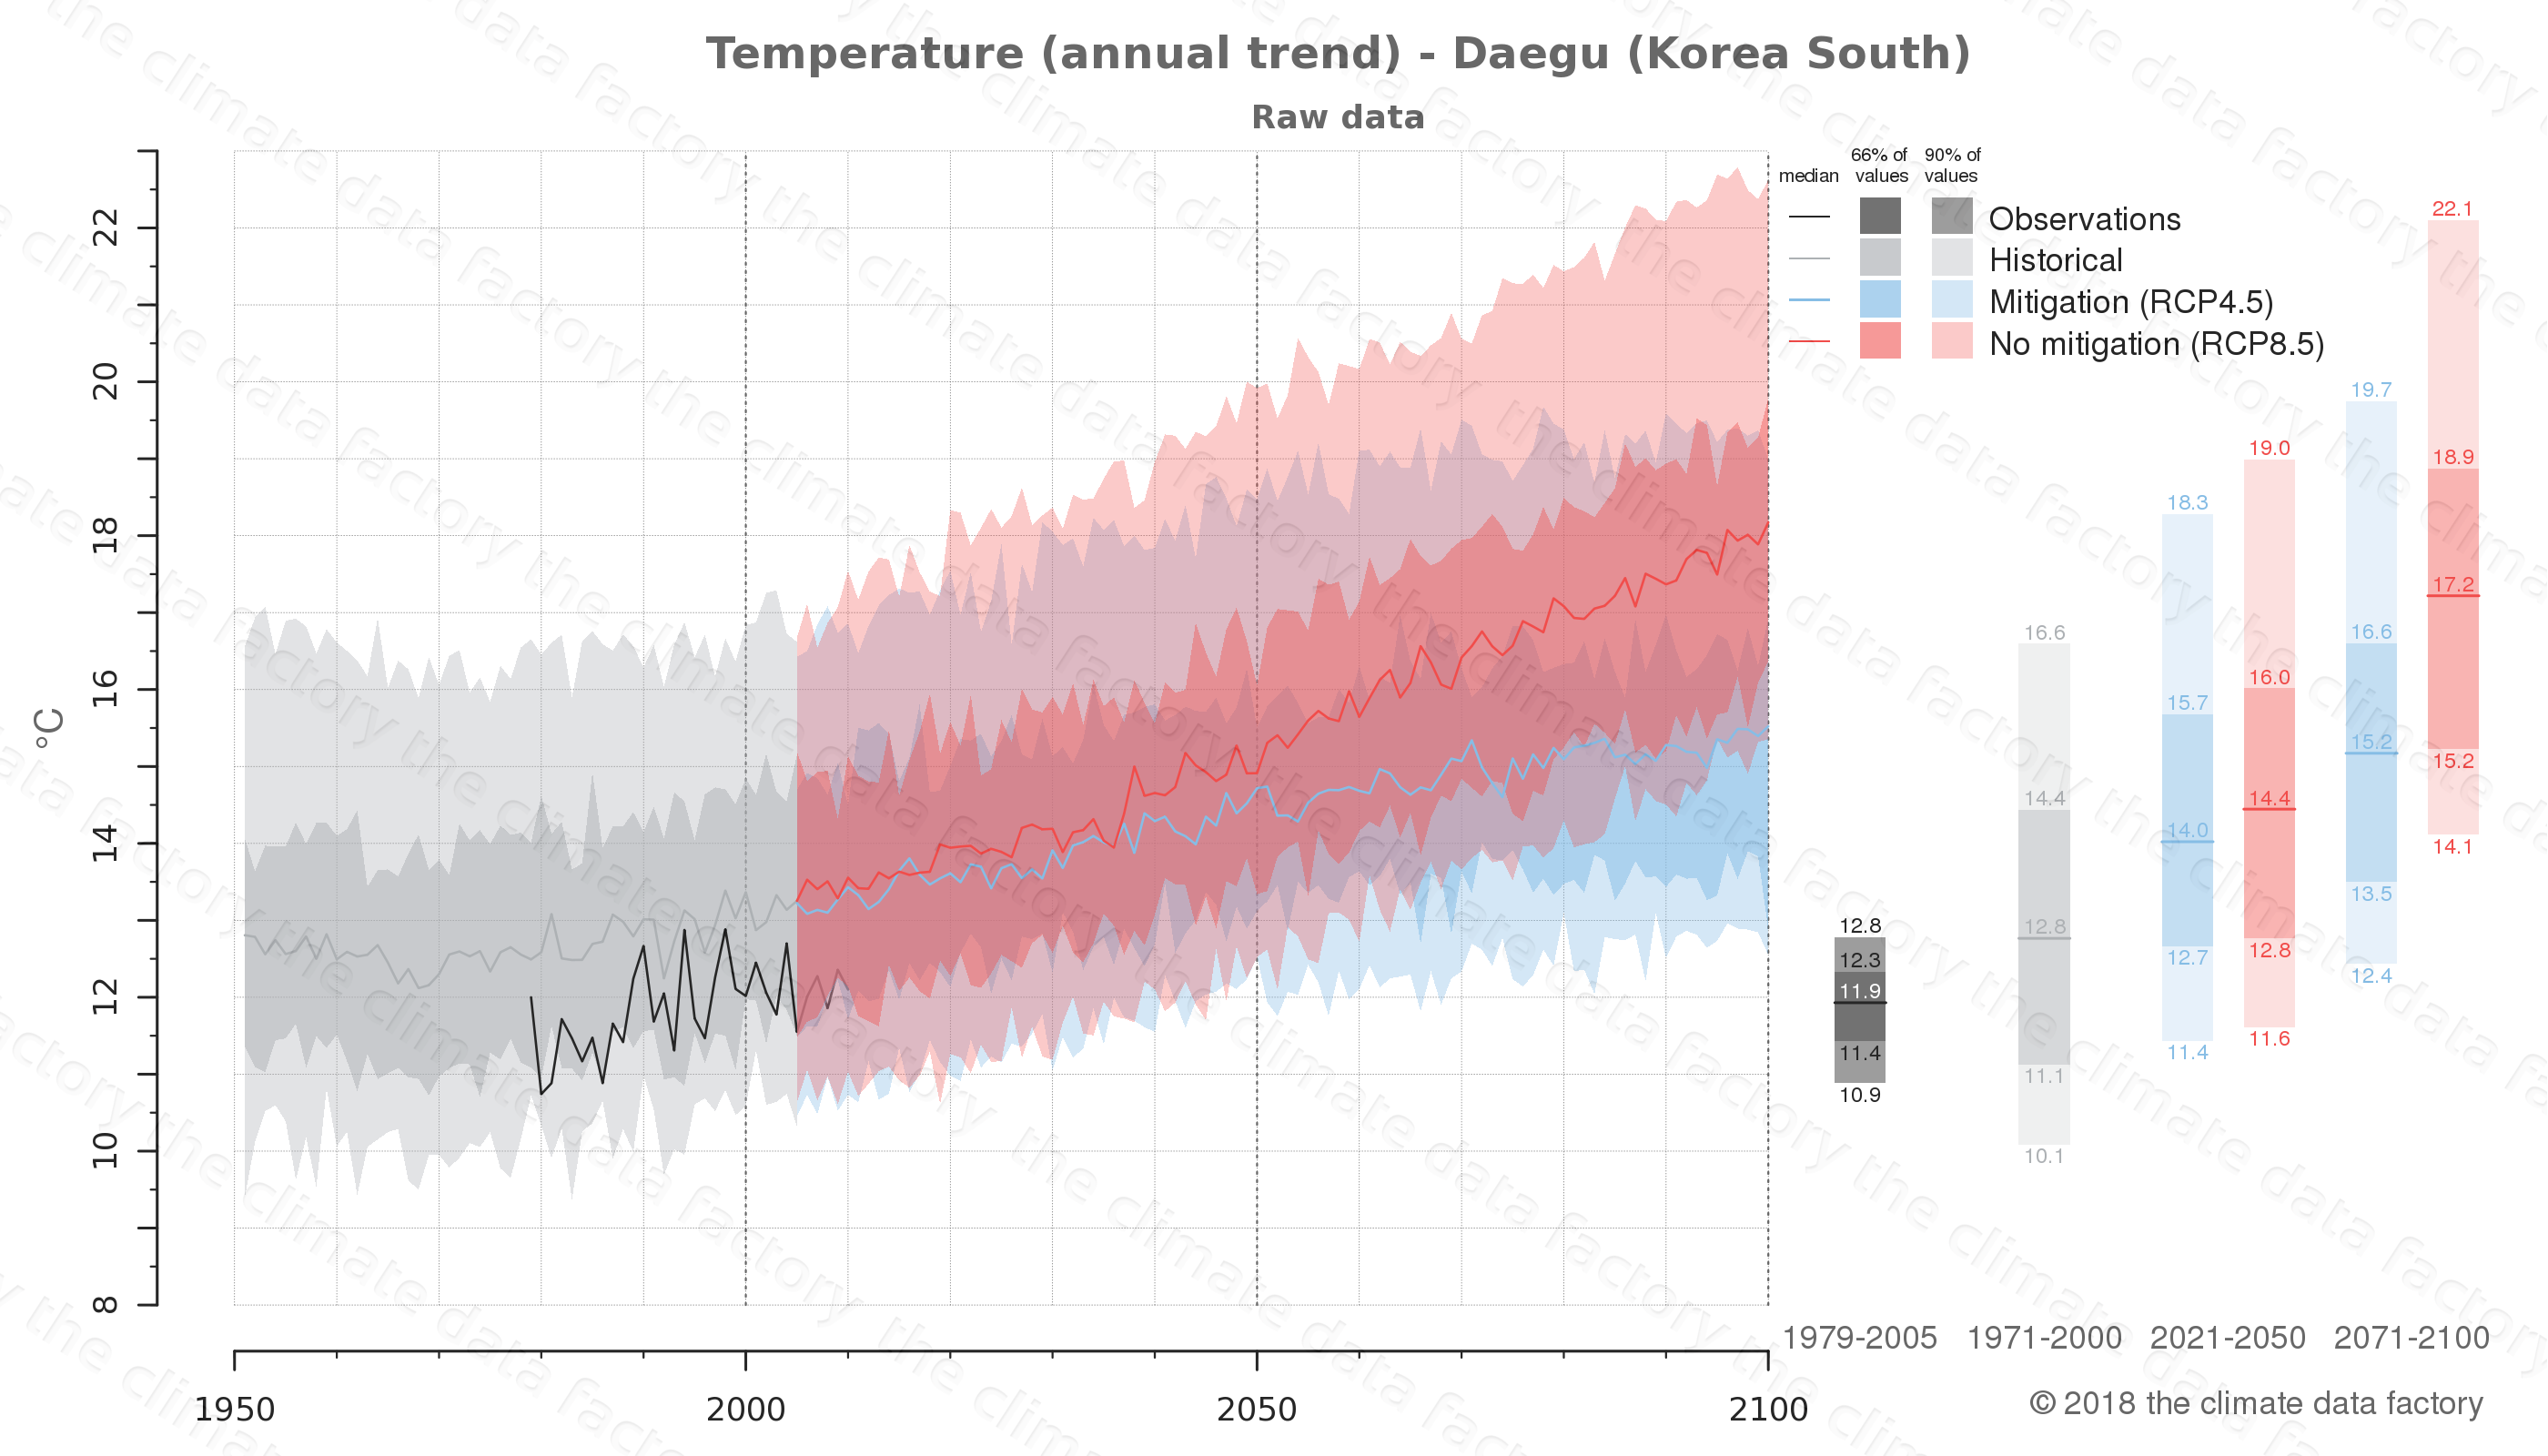 climate change data policy adaptation climate graph city data temperature daegu south korea